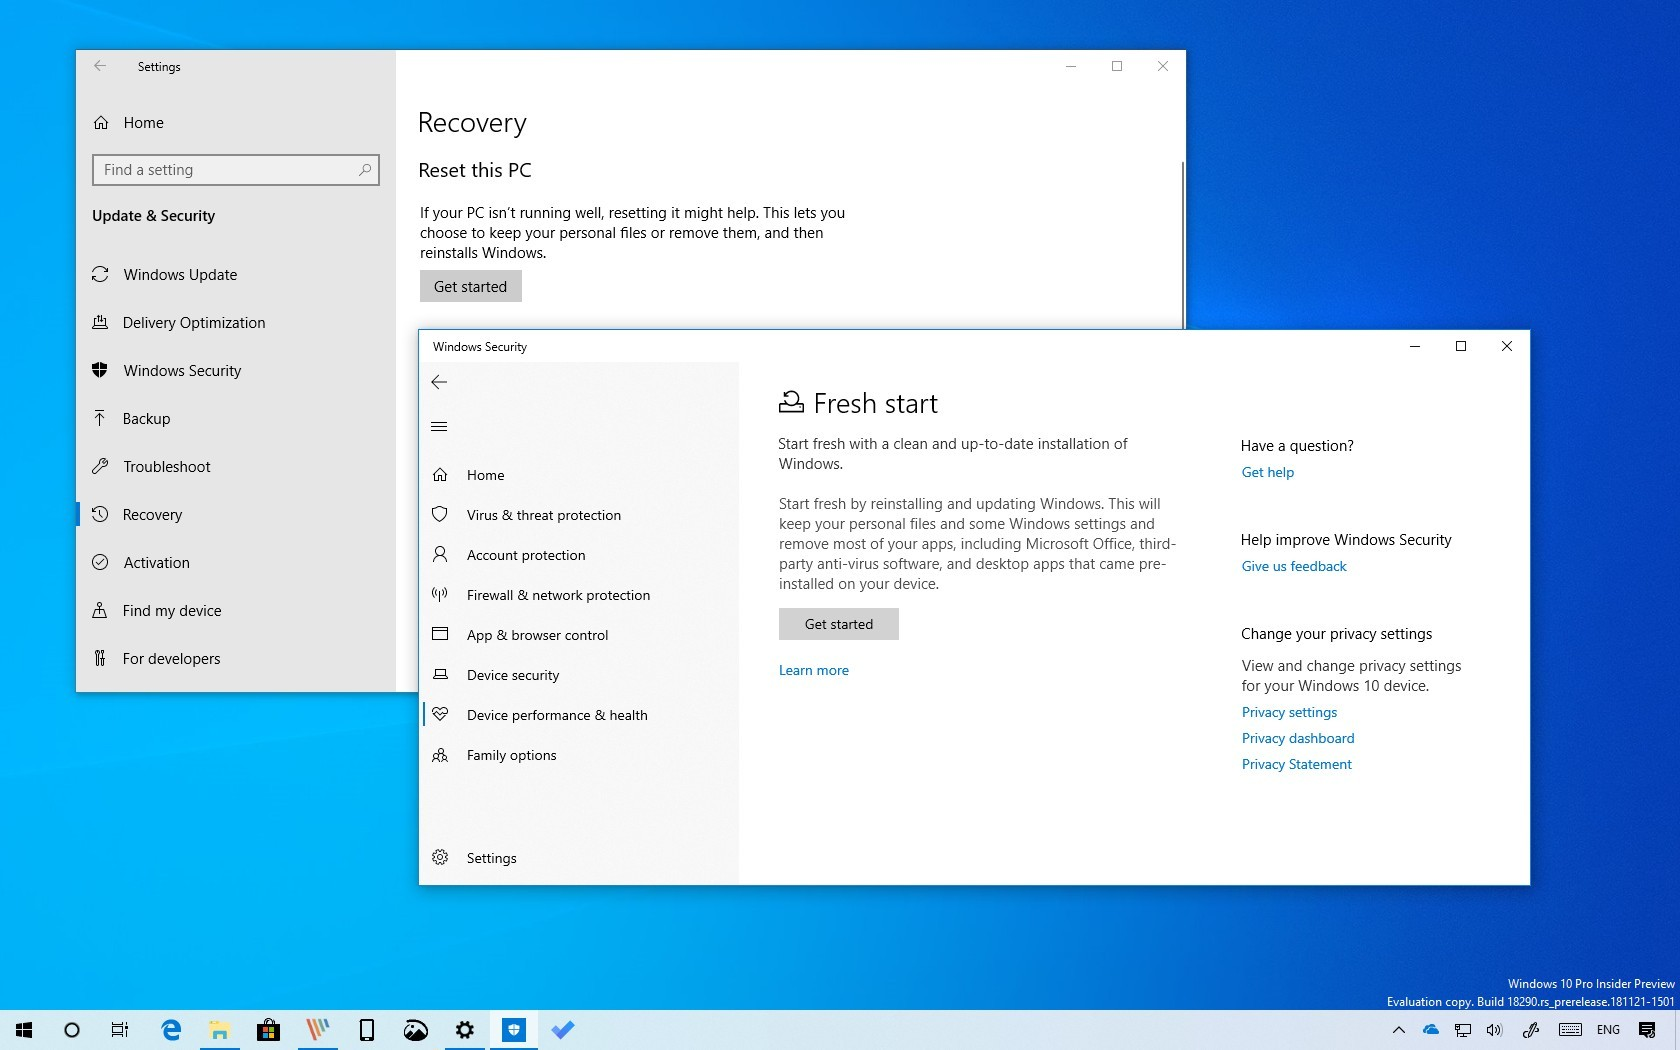 Reset this PC vs Fresh Start on Windows 10